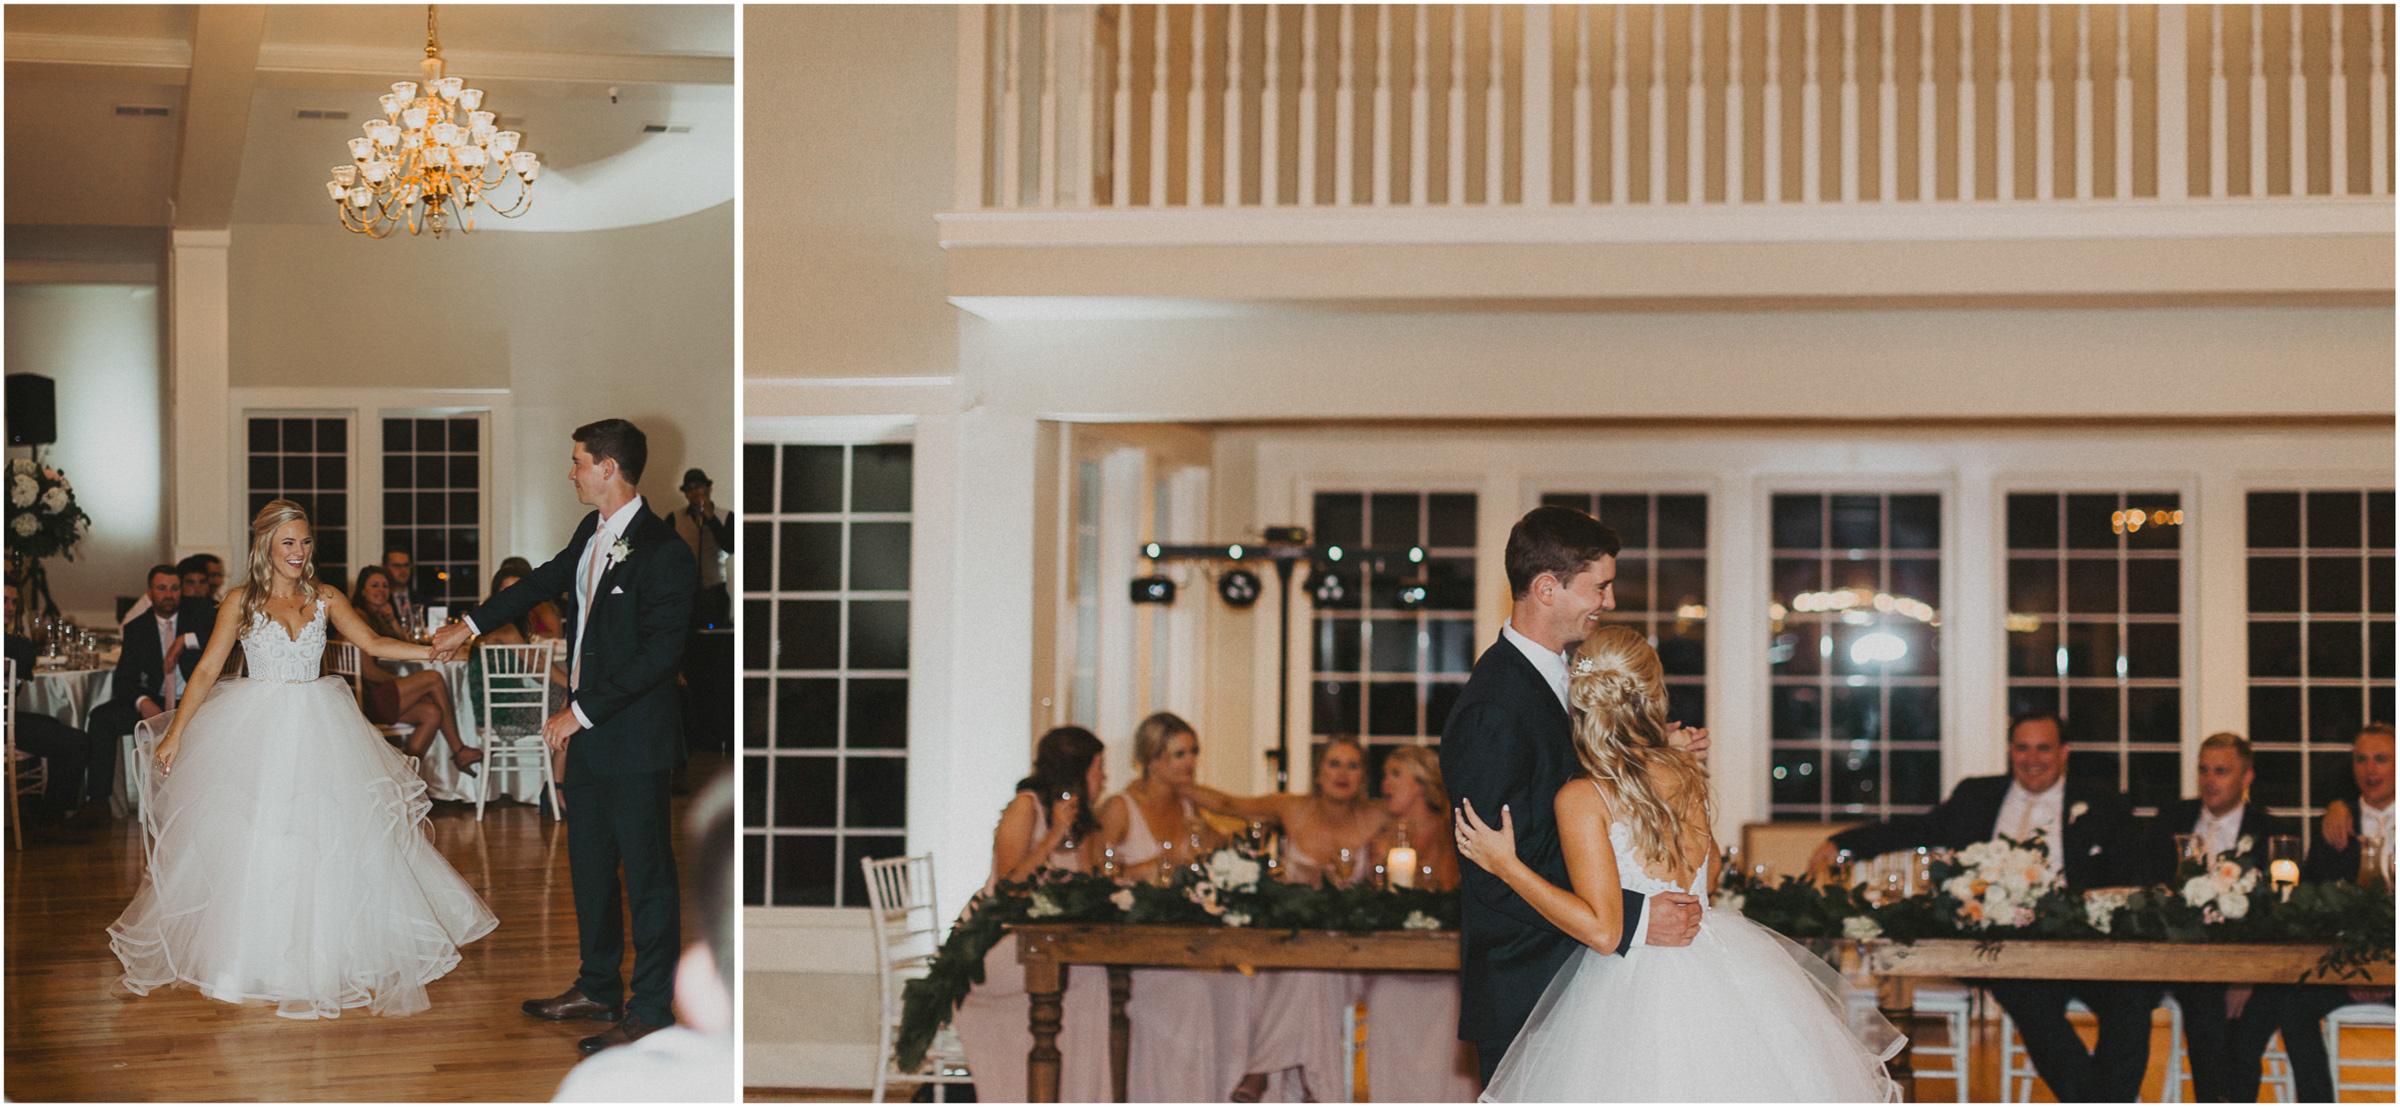 alyssa barletter photography hawthorne house summer outdoor wedding southern charm inspiration-70.jpg